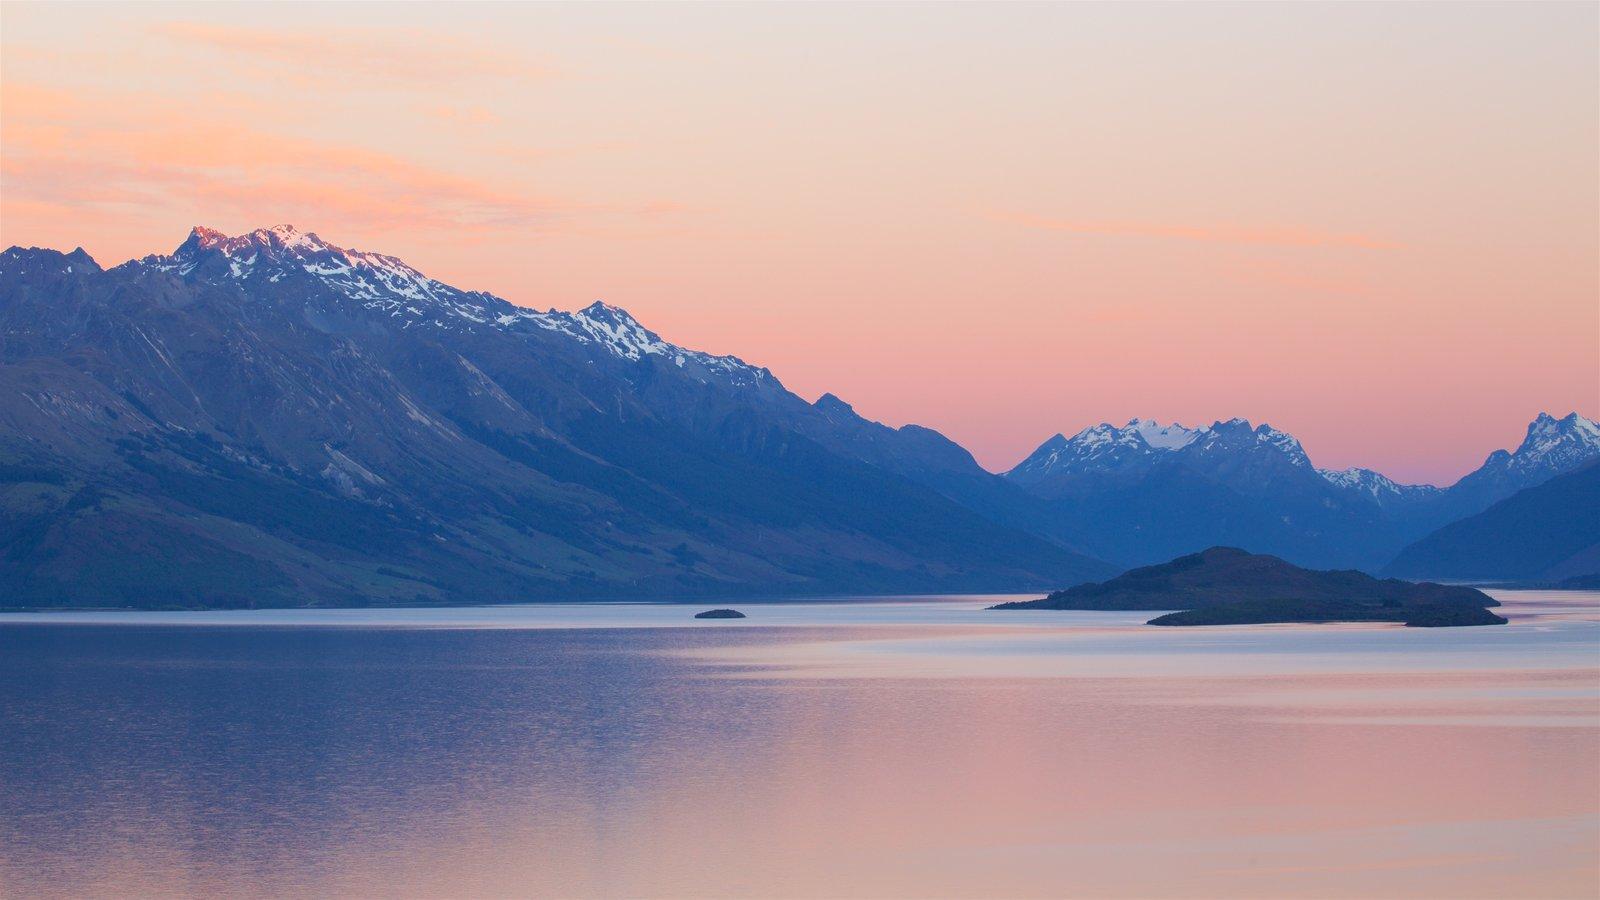 Lake Wakatipu showing mountains, snow and a sunset